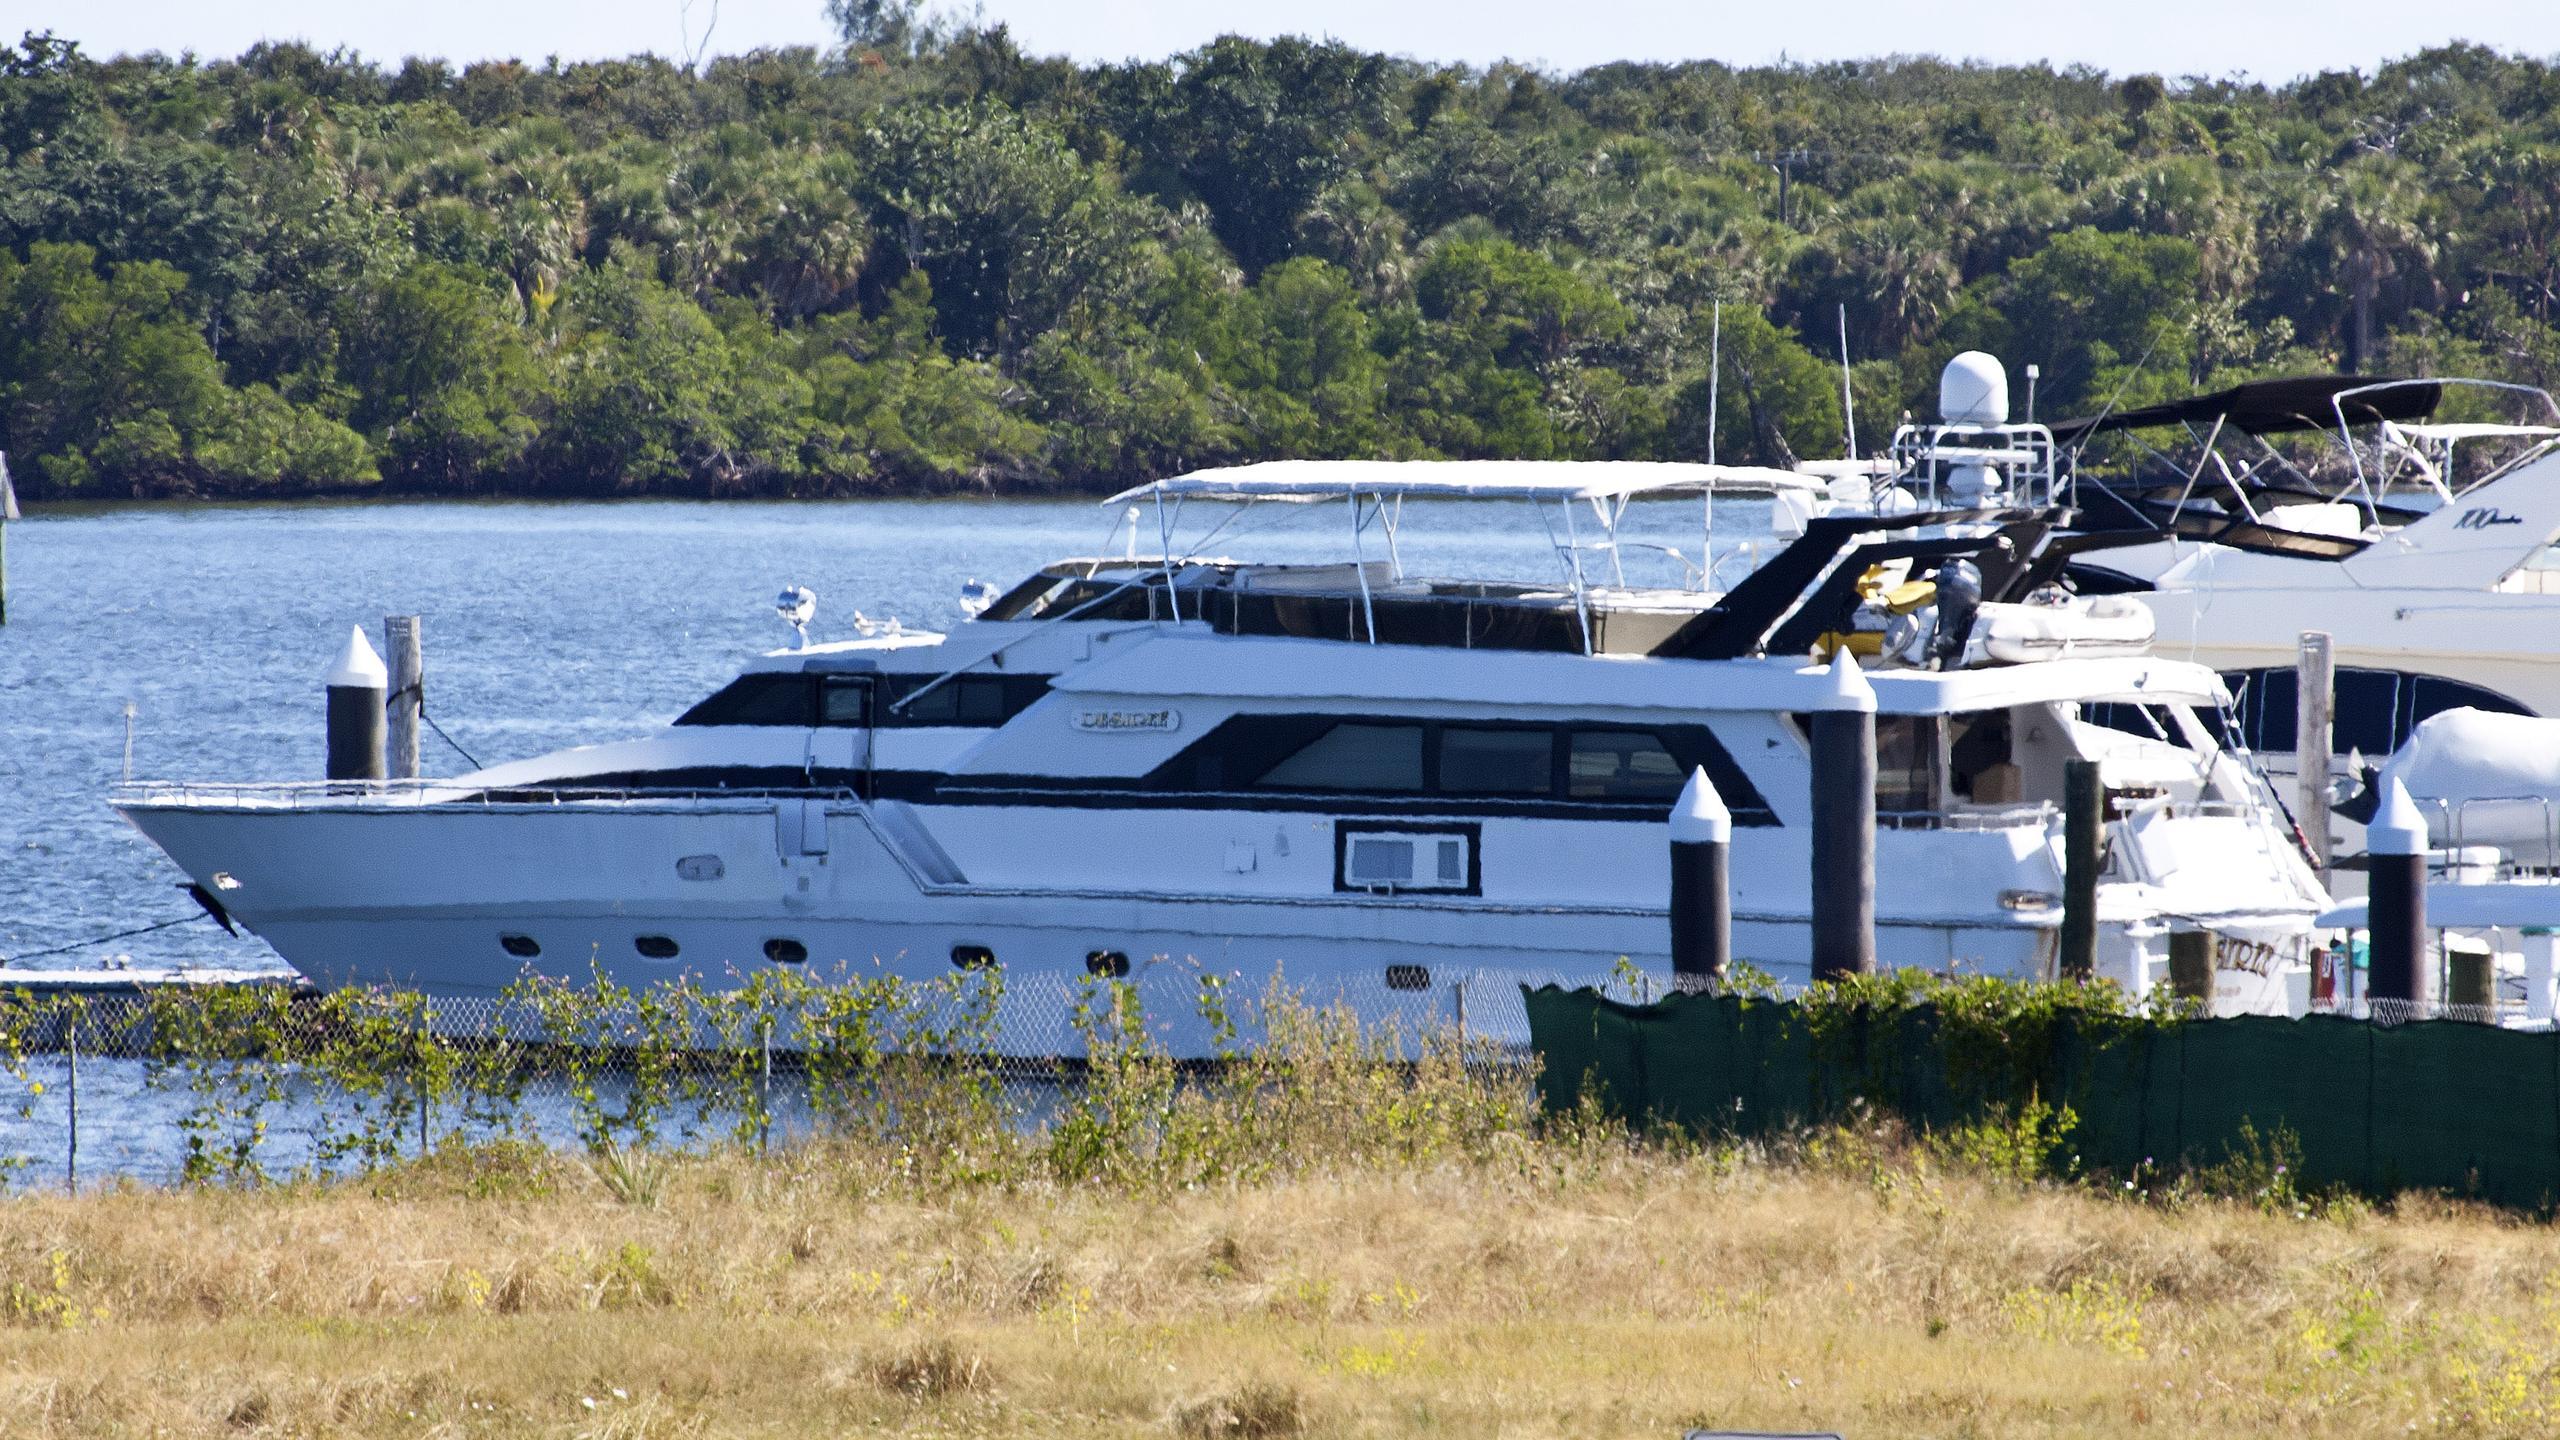 desiree-motoryacht-intercantieri-1986-26m-profile